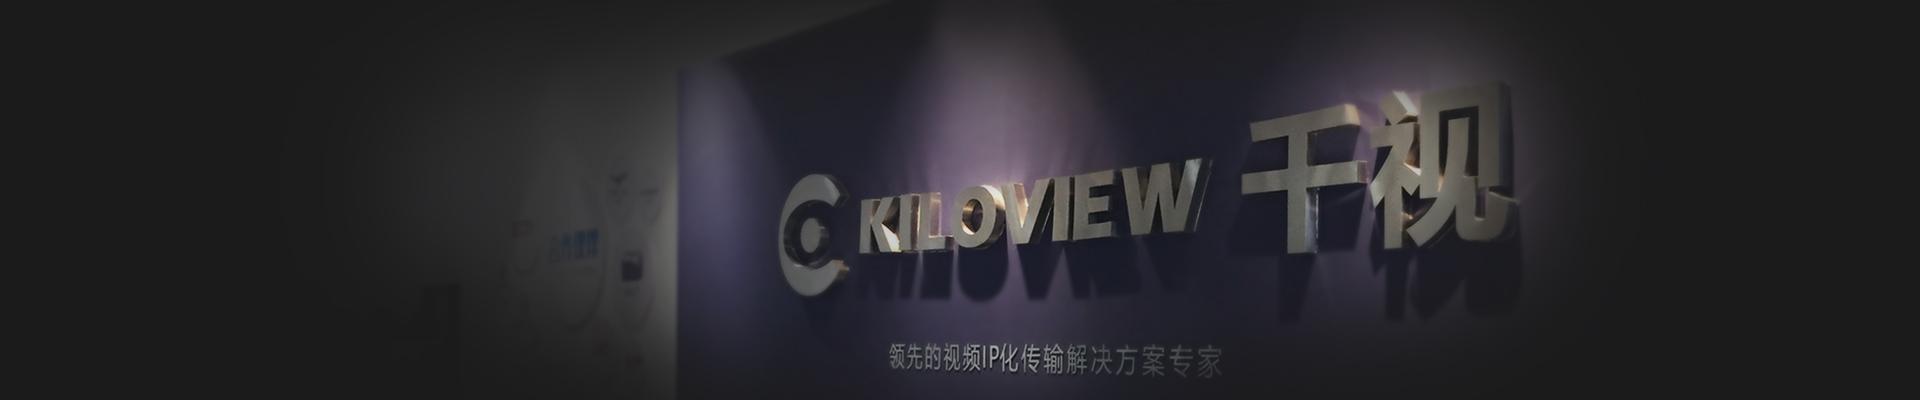 Kiloview-company-background